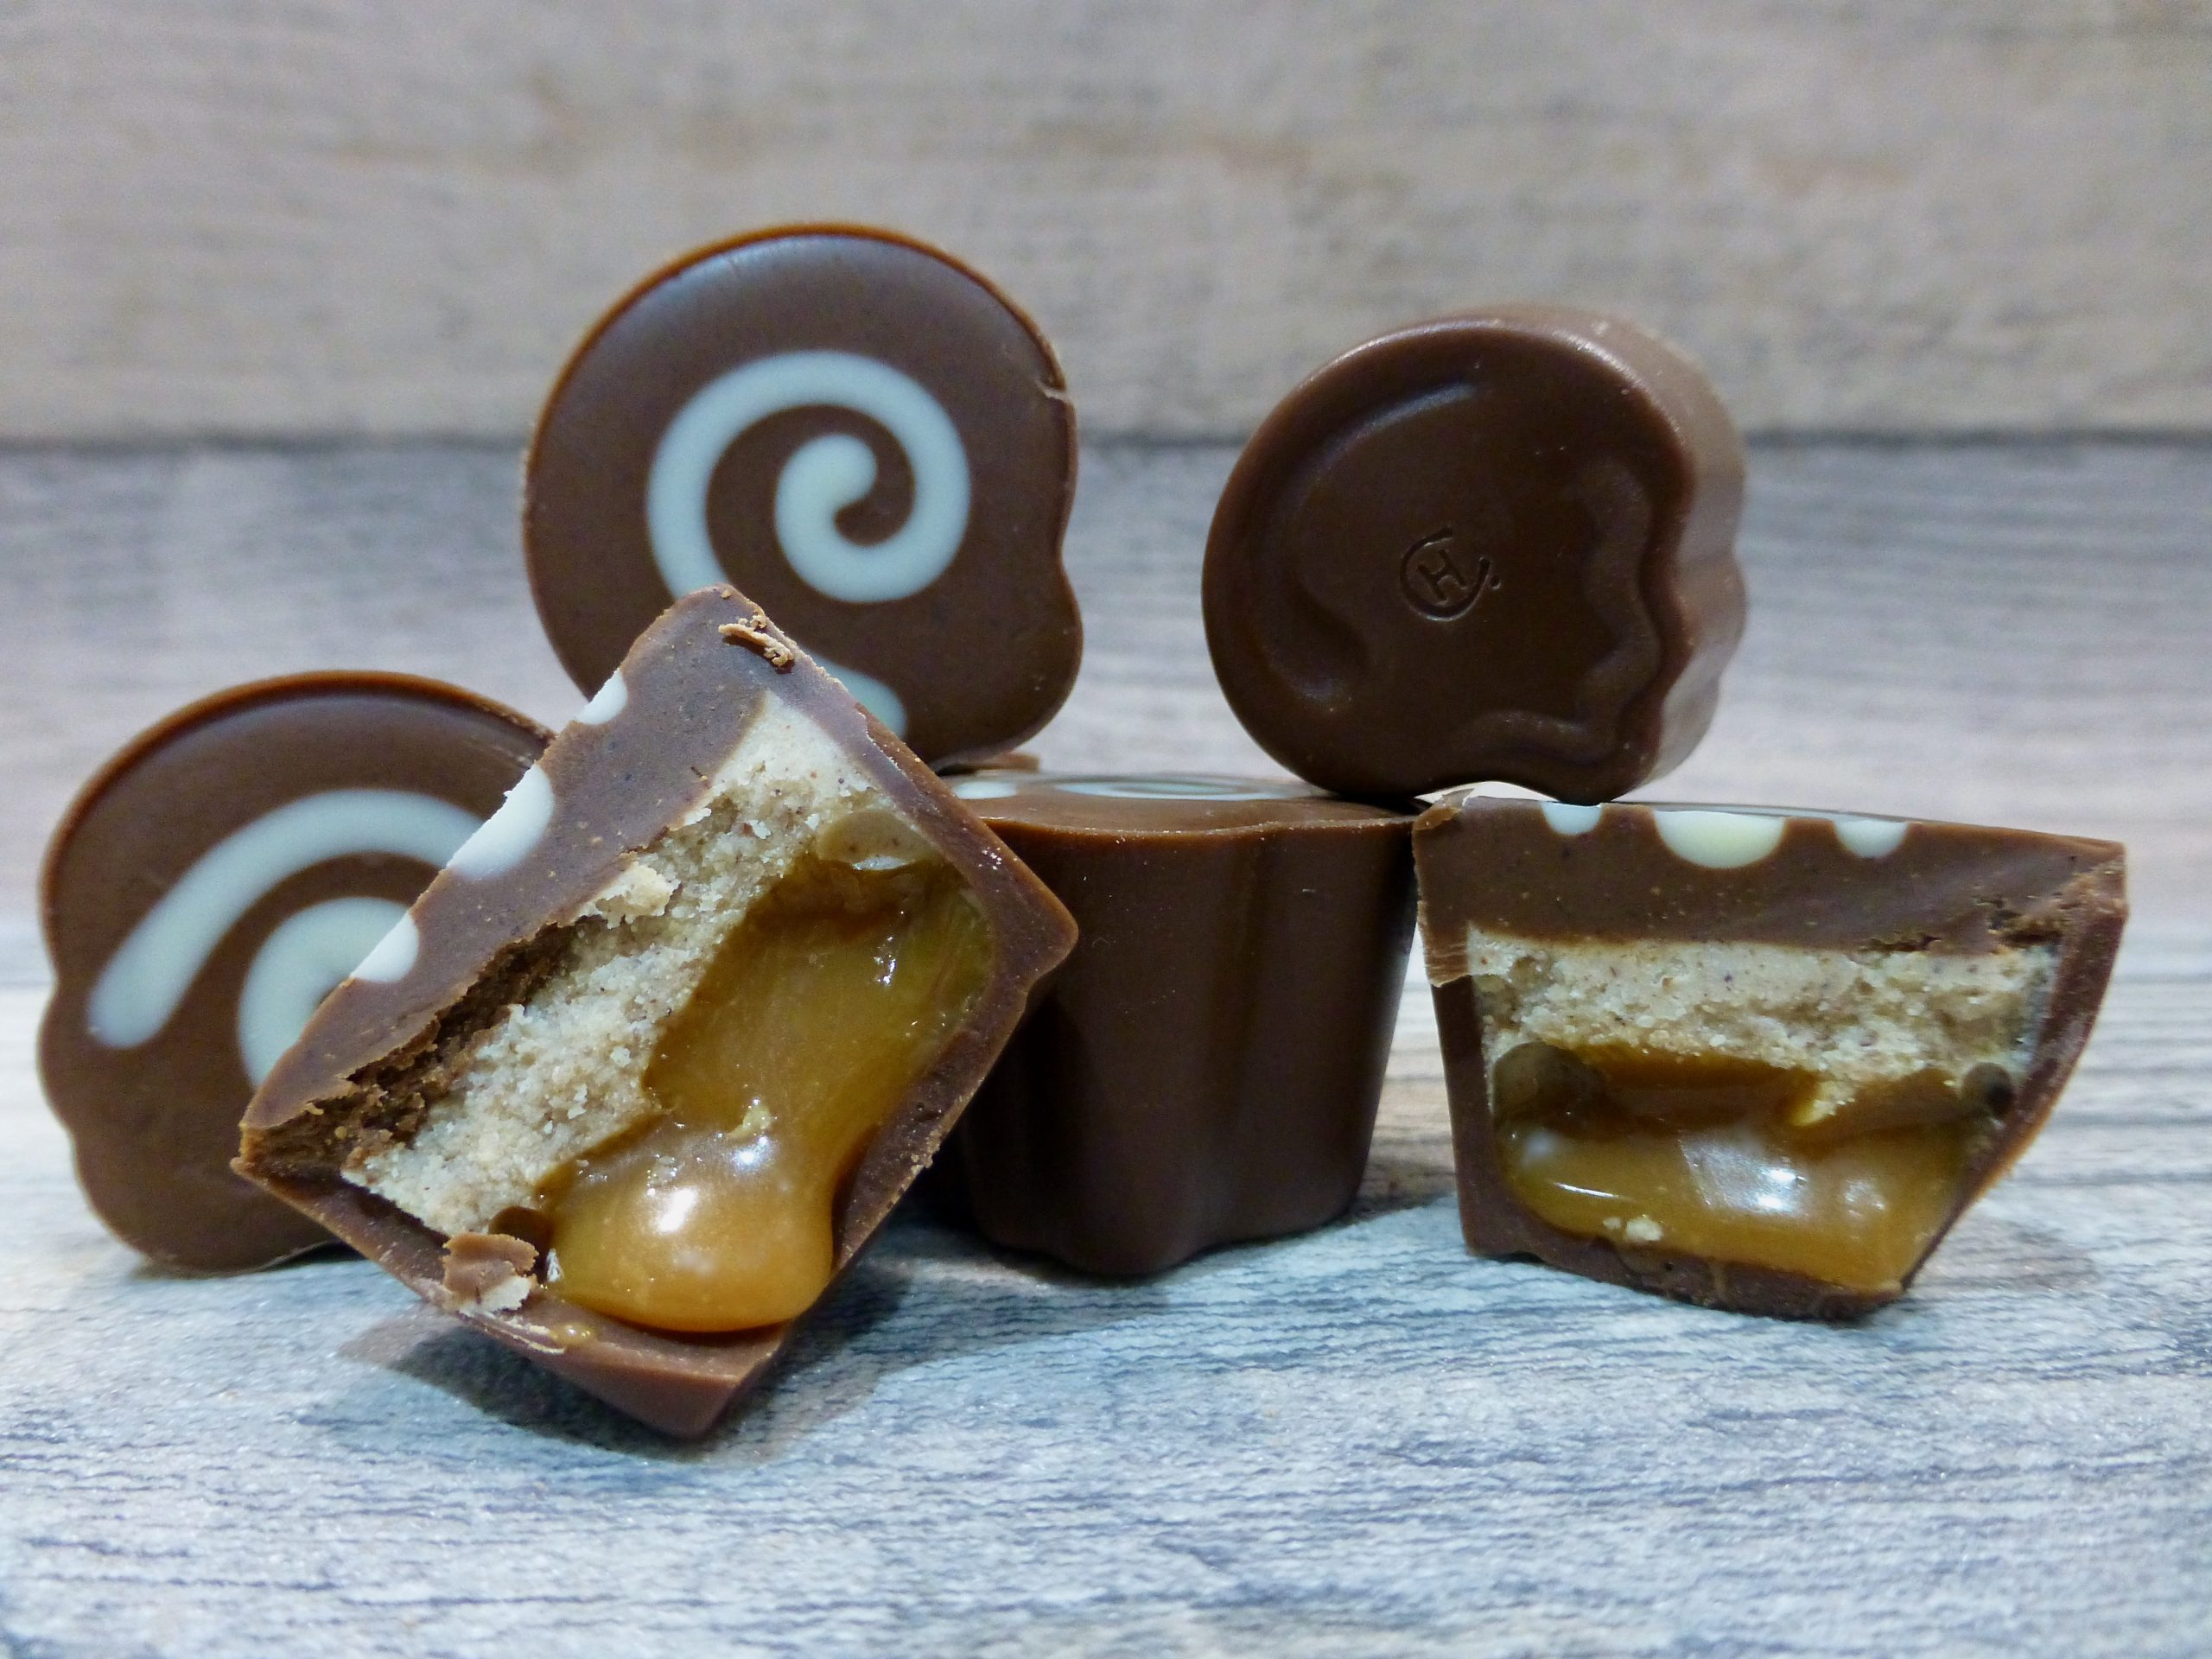 Hotel Chocolat Cinnamon Buns Review